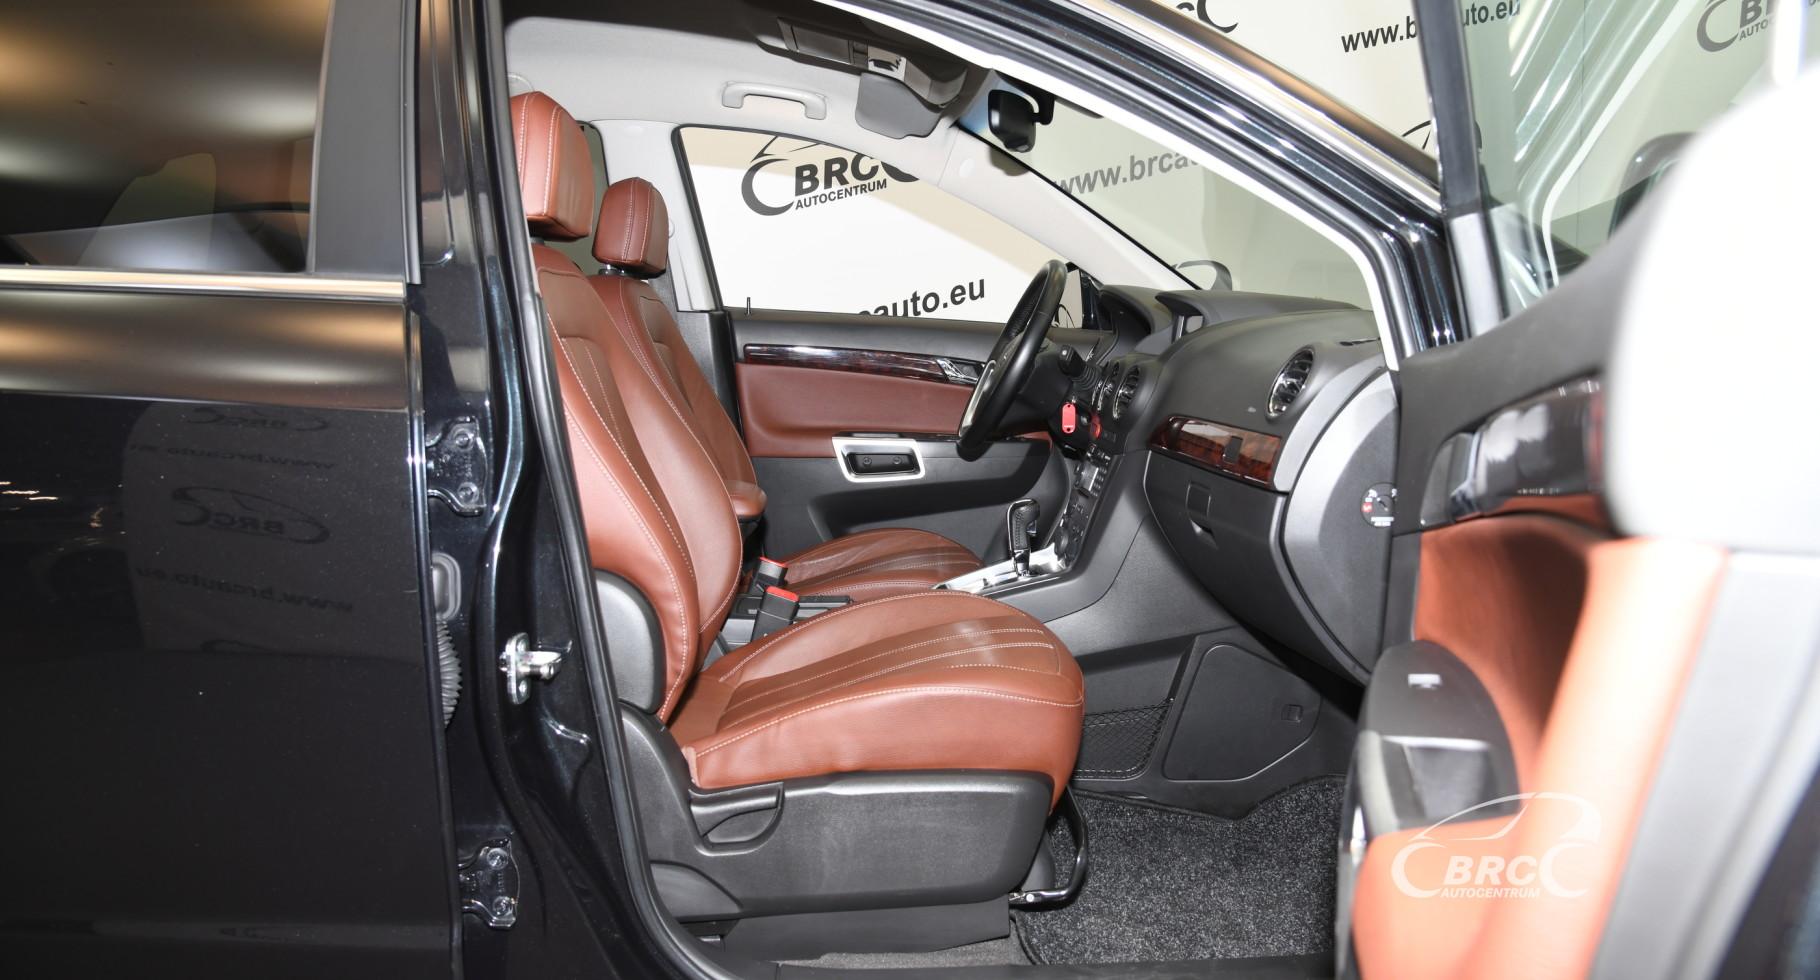 Opel Antara 2.2 CDTi Cosmo 4x4 Automatas